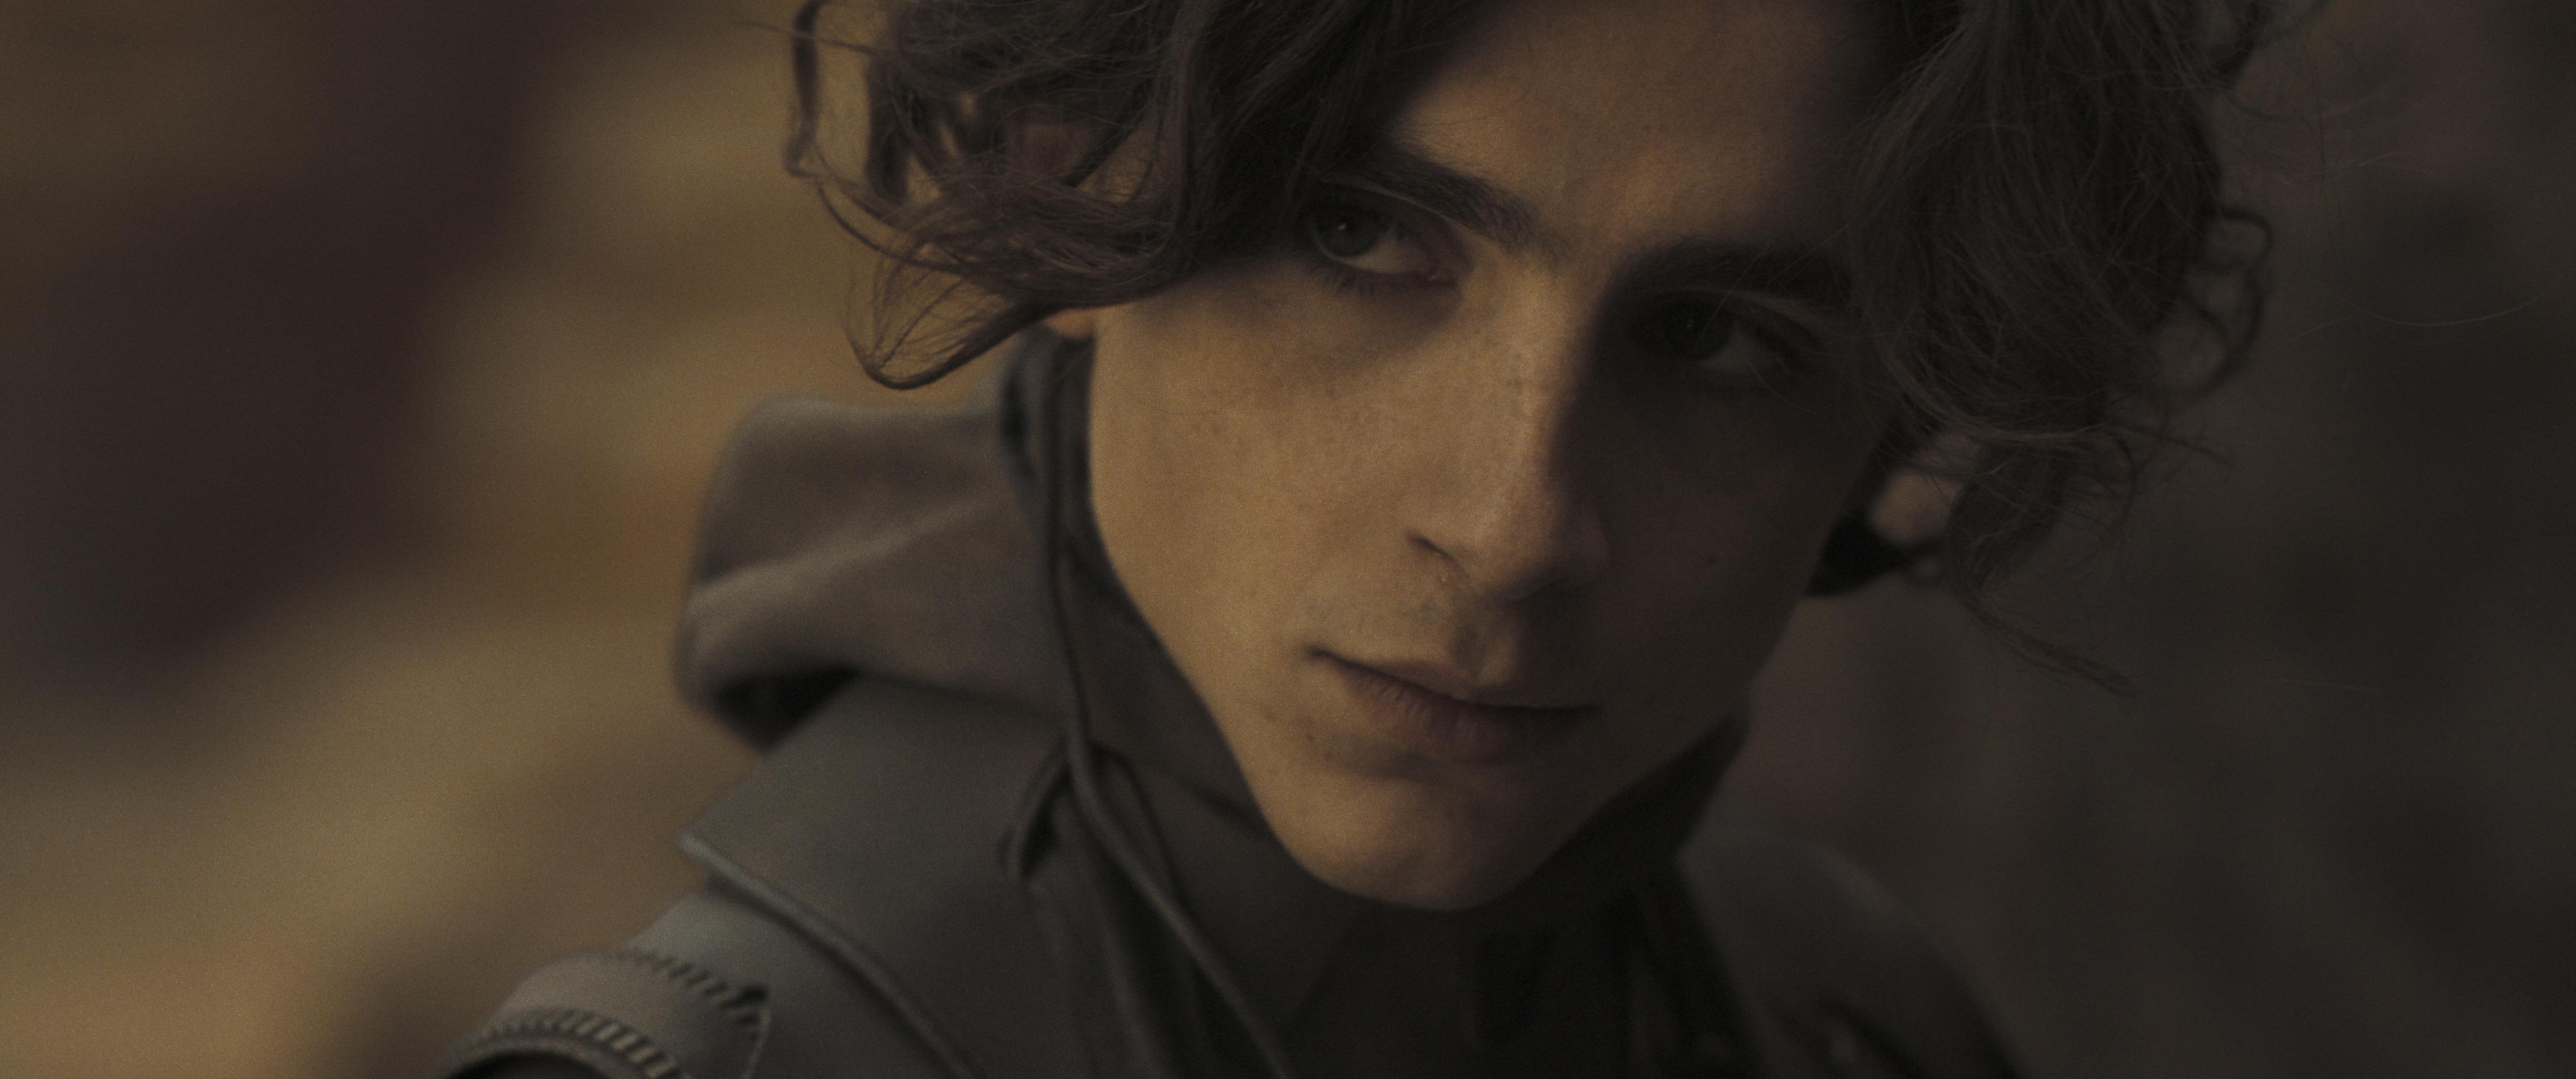 Timothee Chalamet looks pensively in Denis Villeneuve's film adaptation of Dune